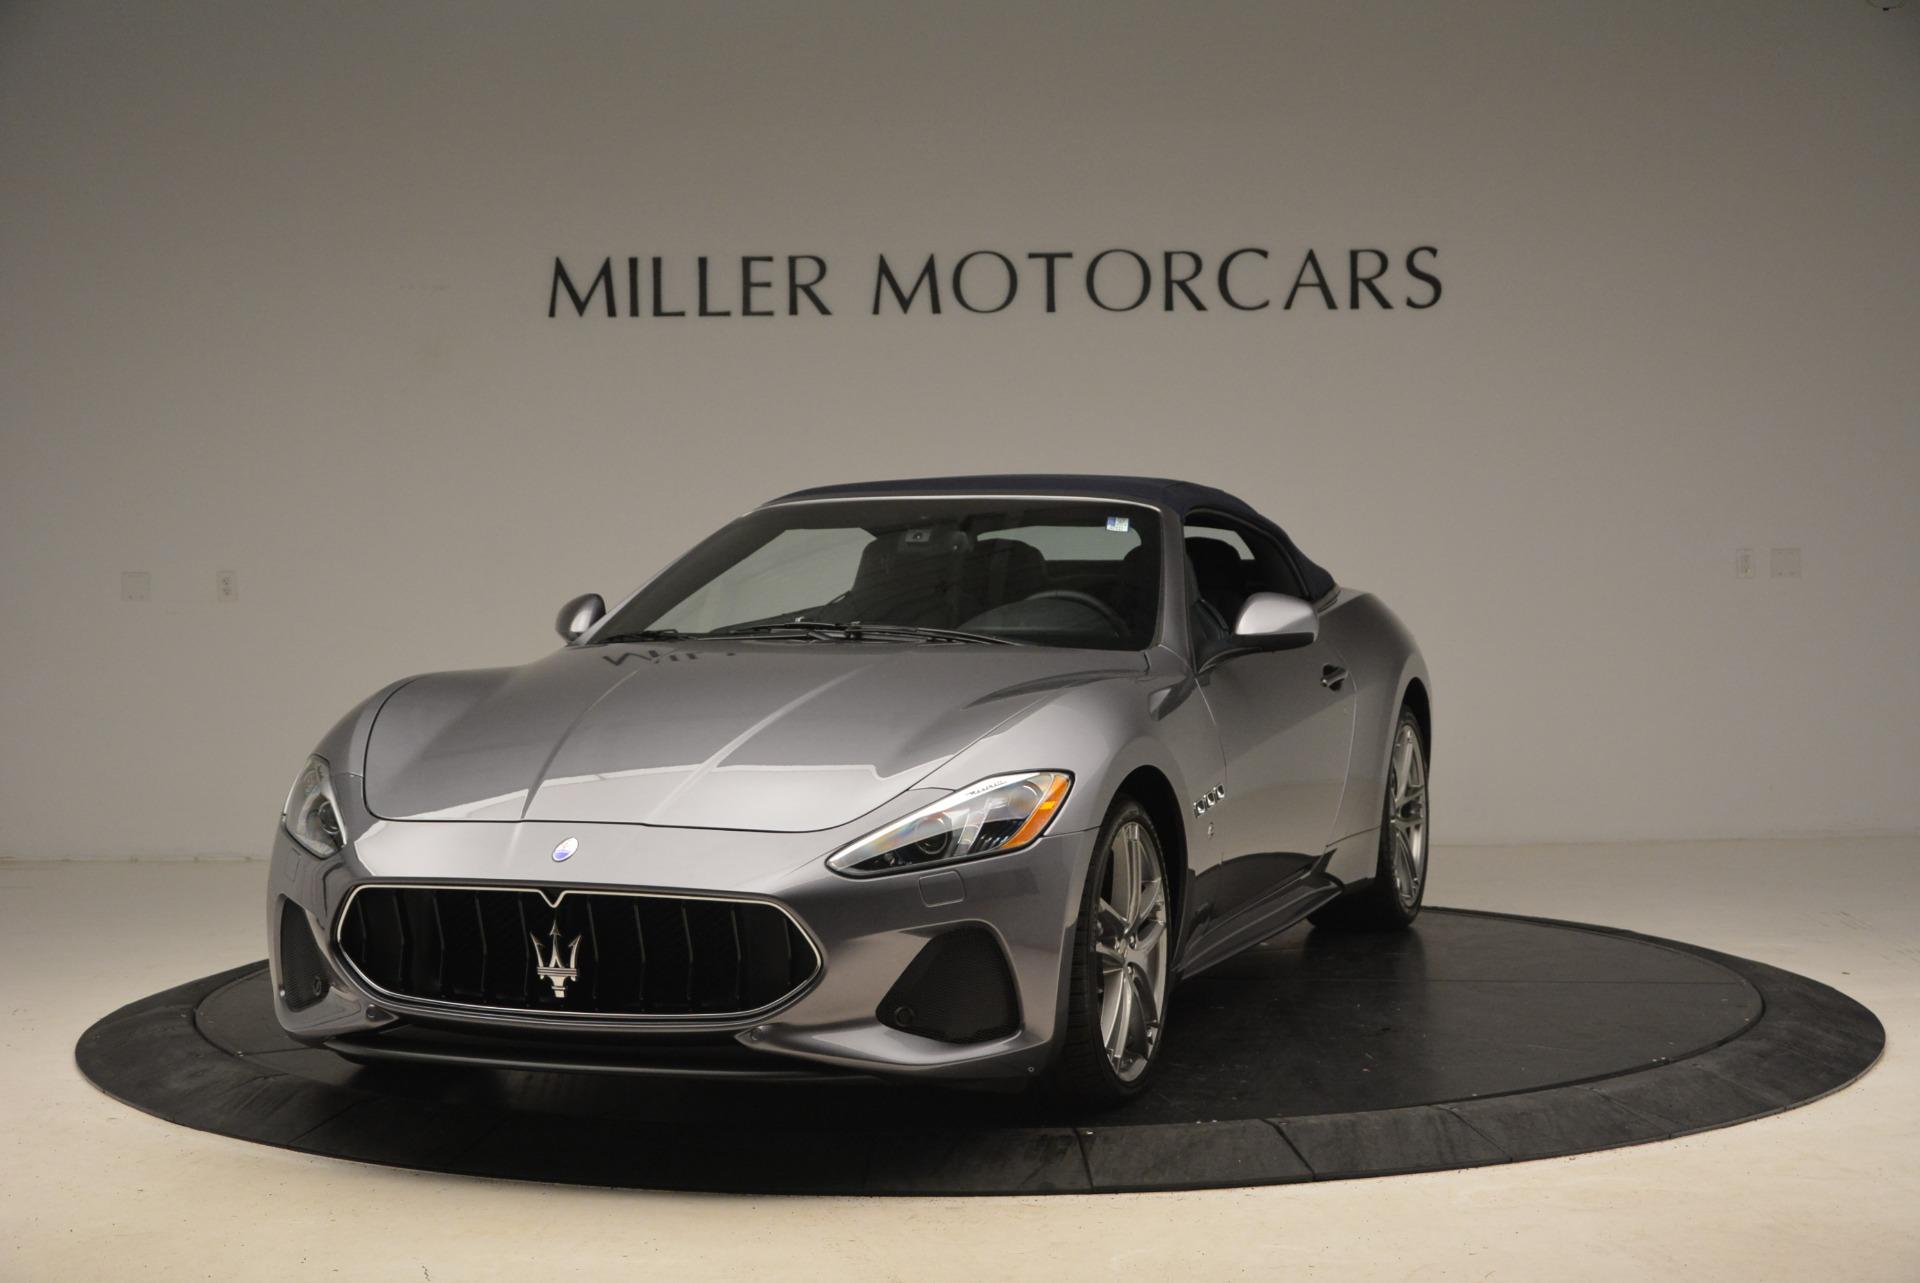 New 2018 Maserati GranTurismo Sport Convertible for sale Sold at McLaren Greenwich in Greenwich CT 06830 1